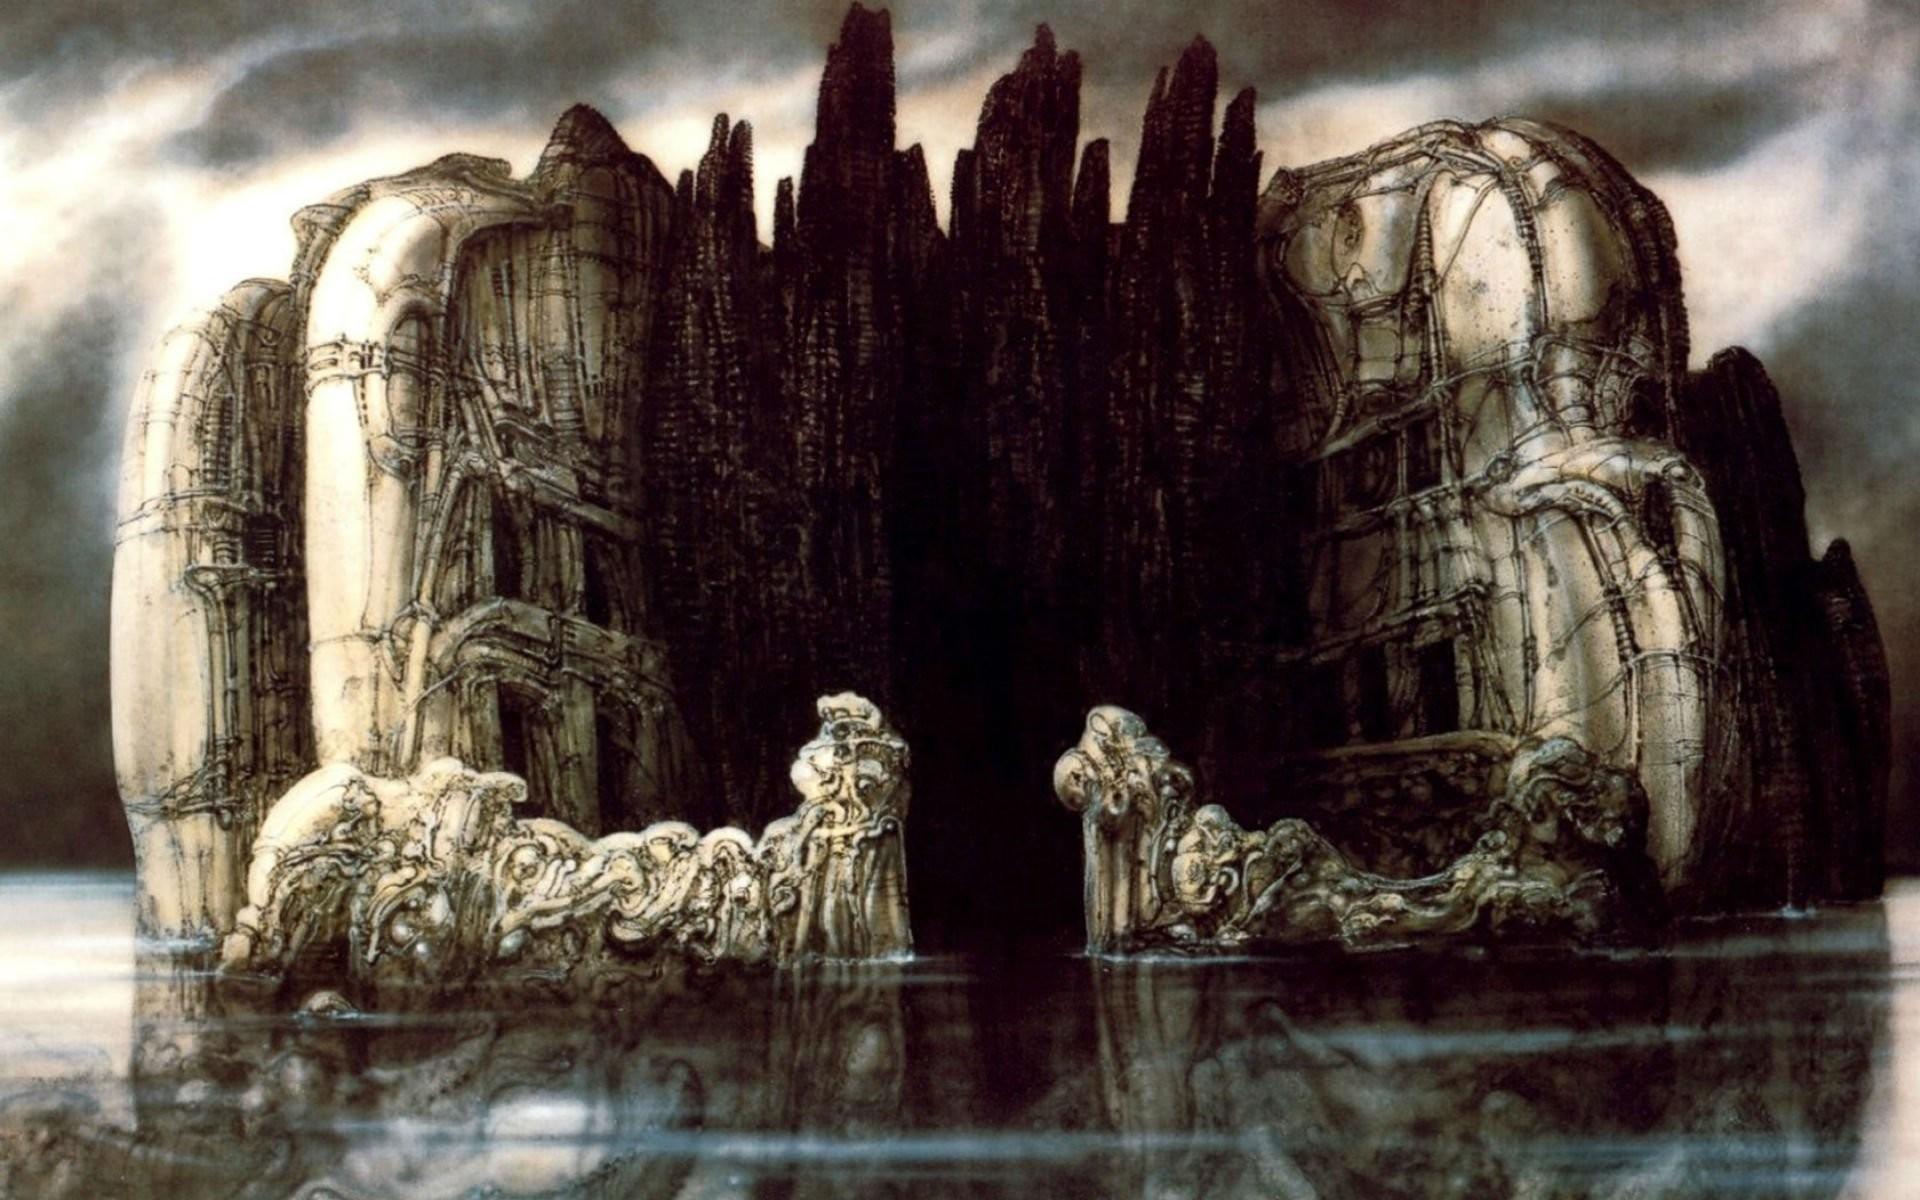 H R Giger Art Artwork Dark Evil Artistic Horror Fantasy Sci-fi Wallpaper At  Dark Wallpapers